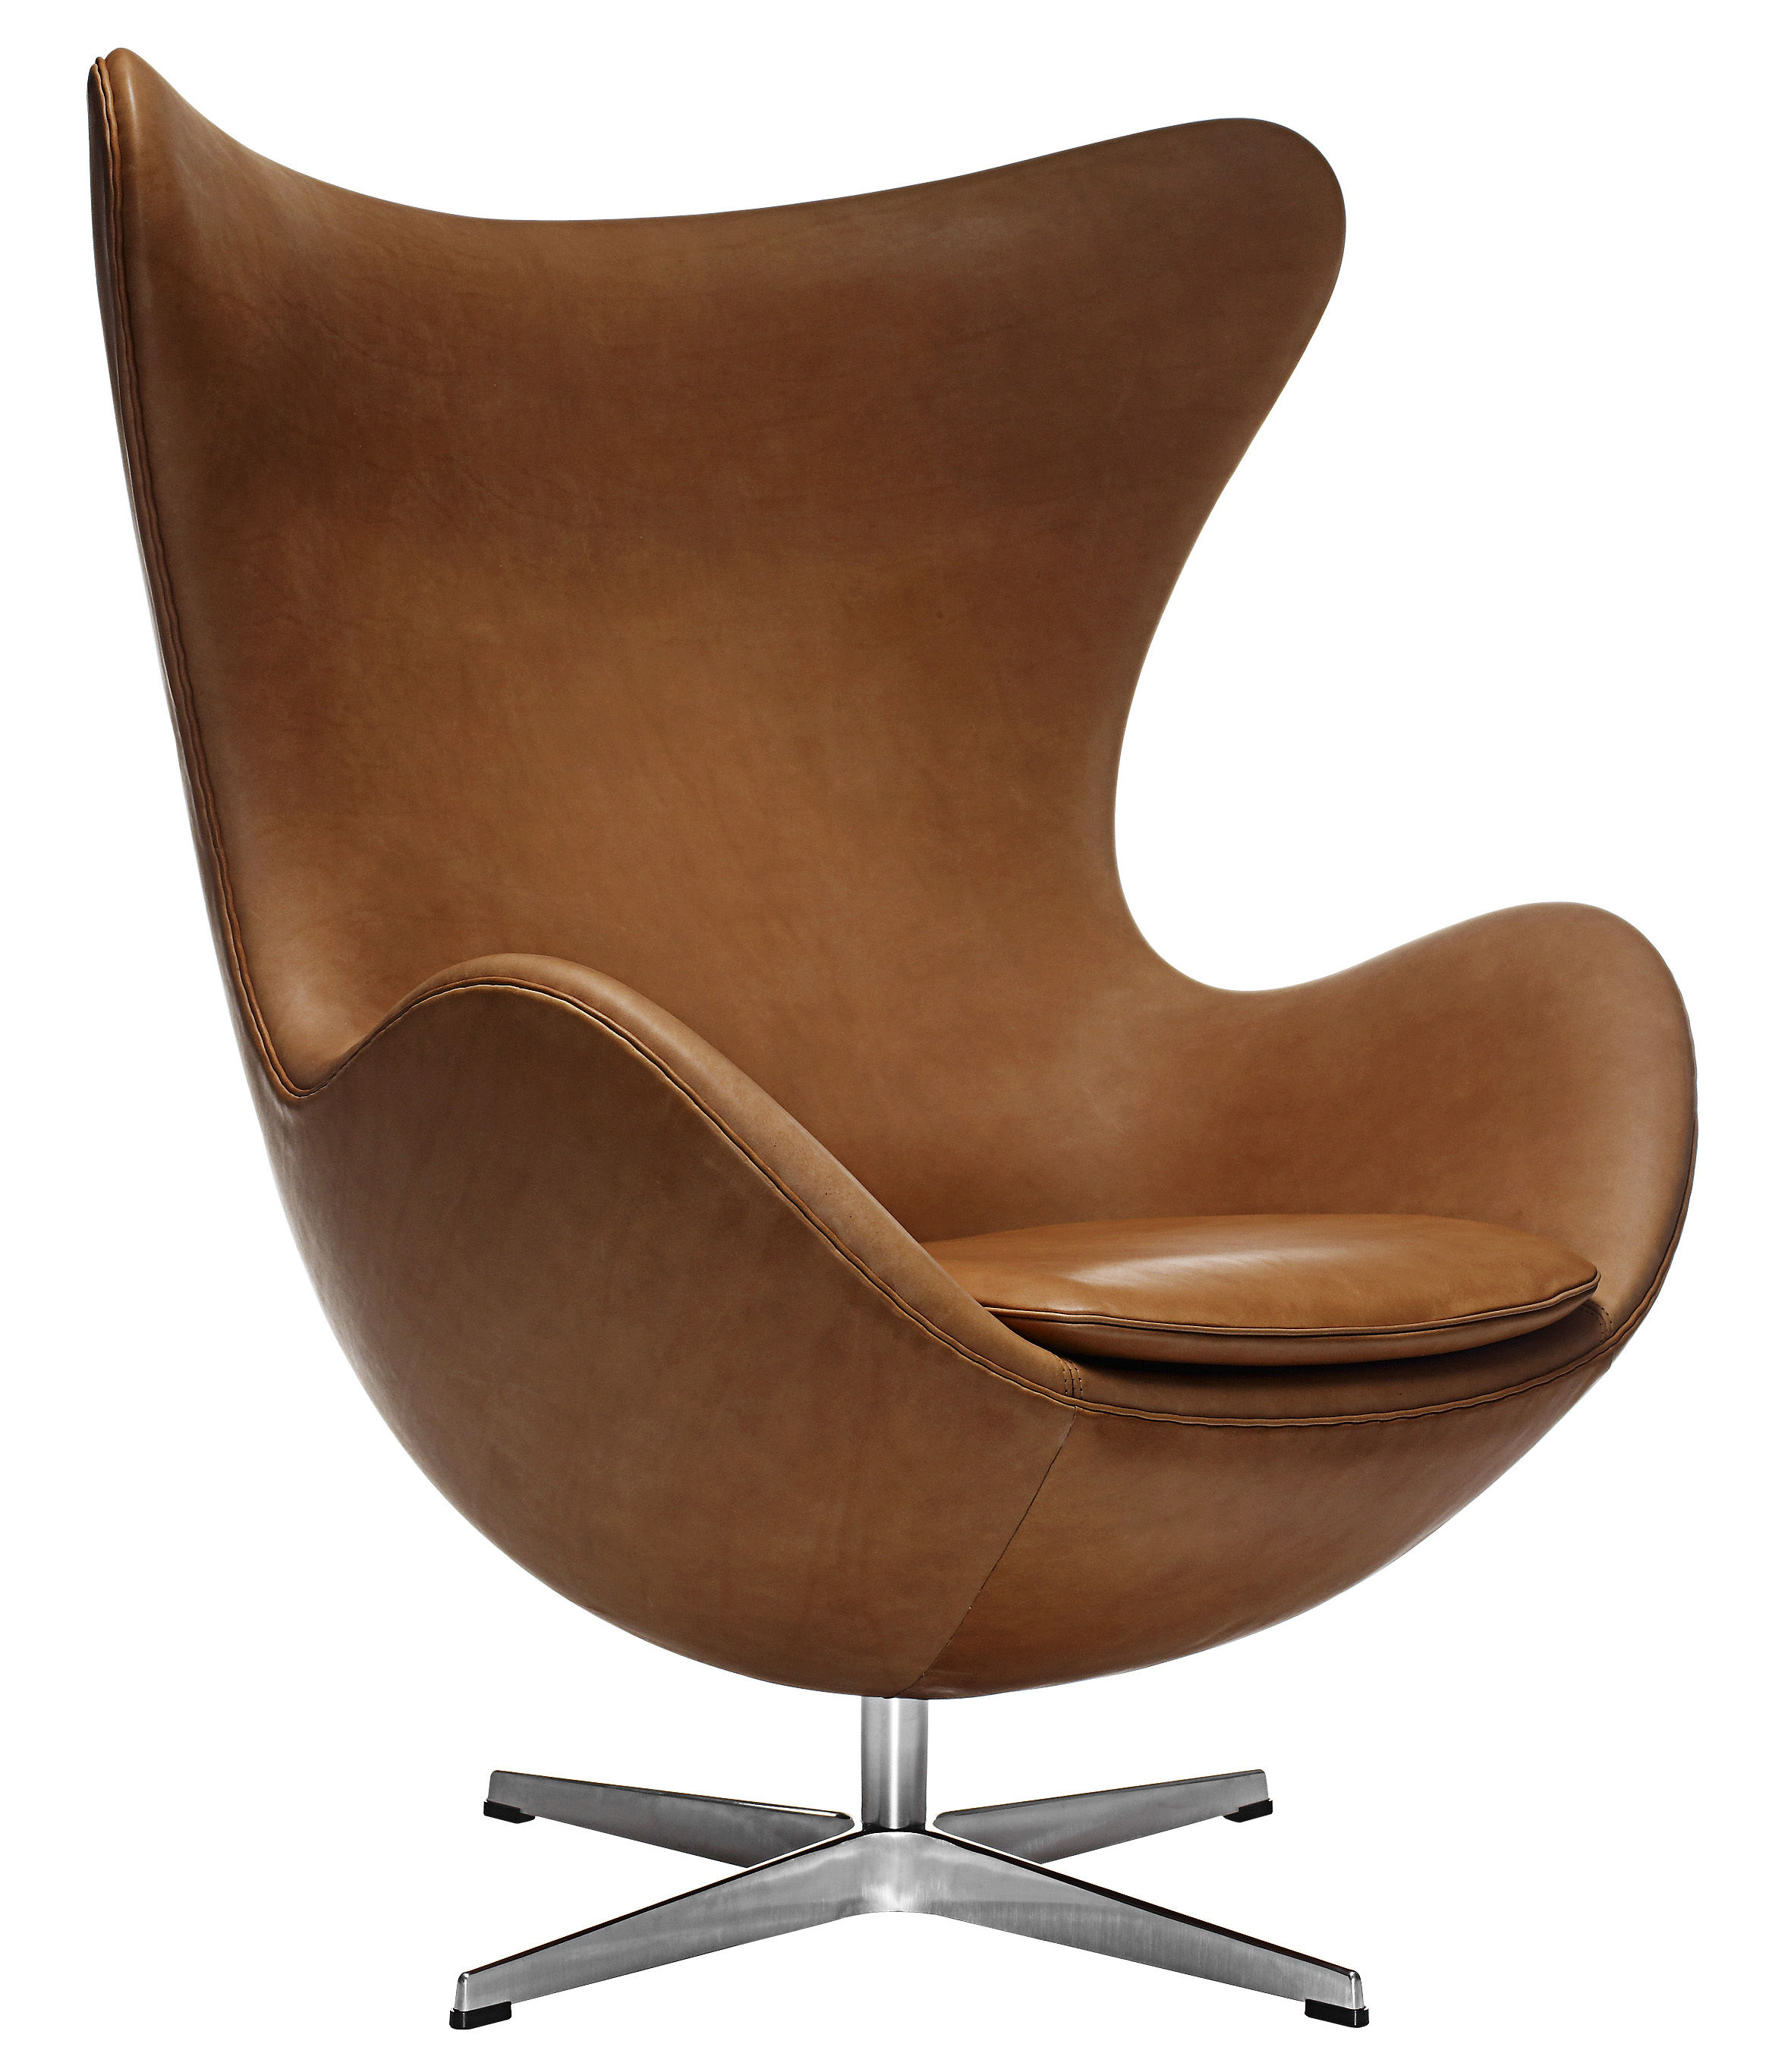 Möbel - Lounge Sessel - Egg chair Drehsessel Leder - Fritz Hansen - Leder braun - Cuir pleine fleur, Glasfaser, poliertes Aluminium, Polyurethan-Schaum